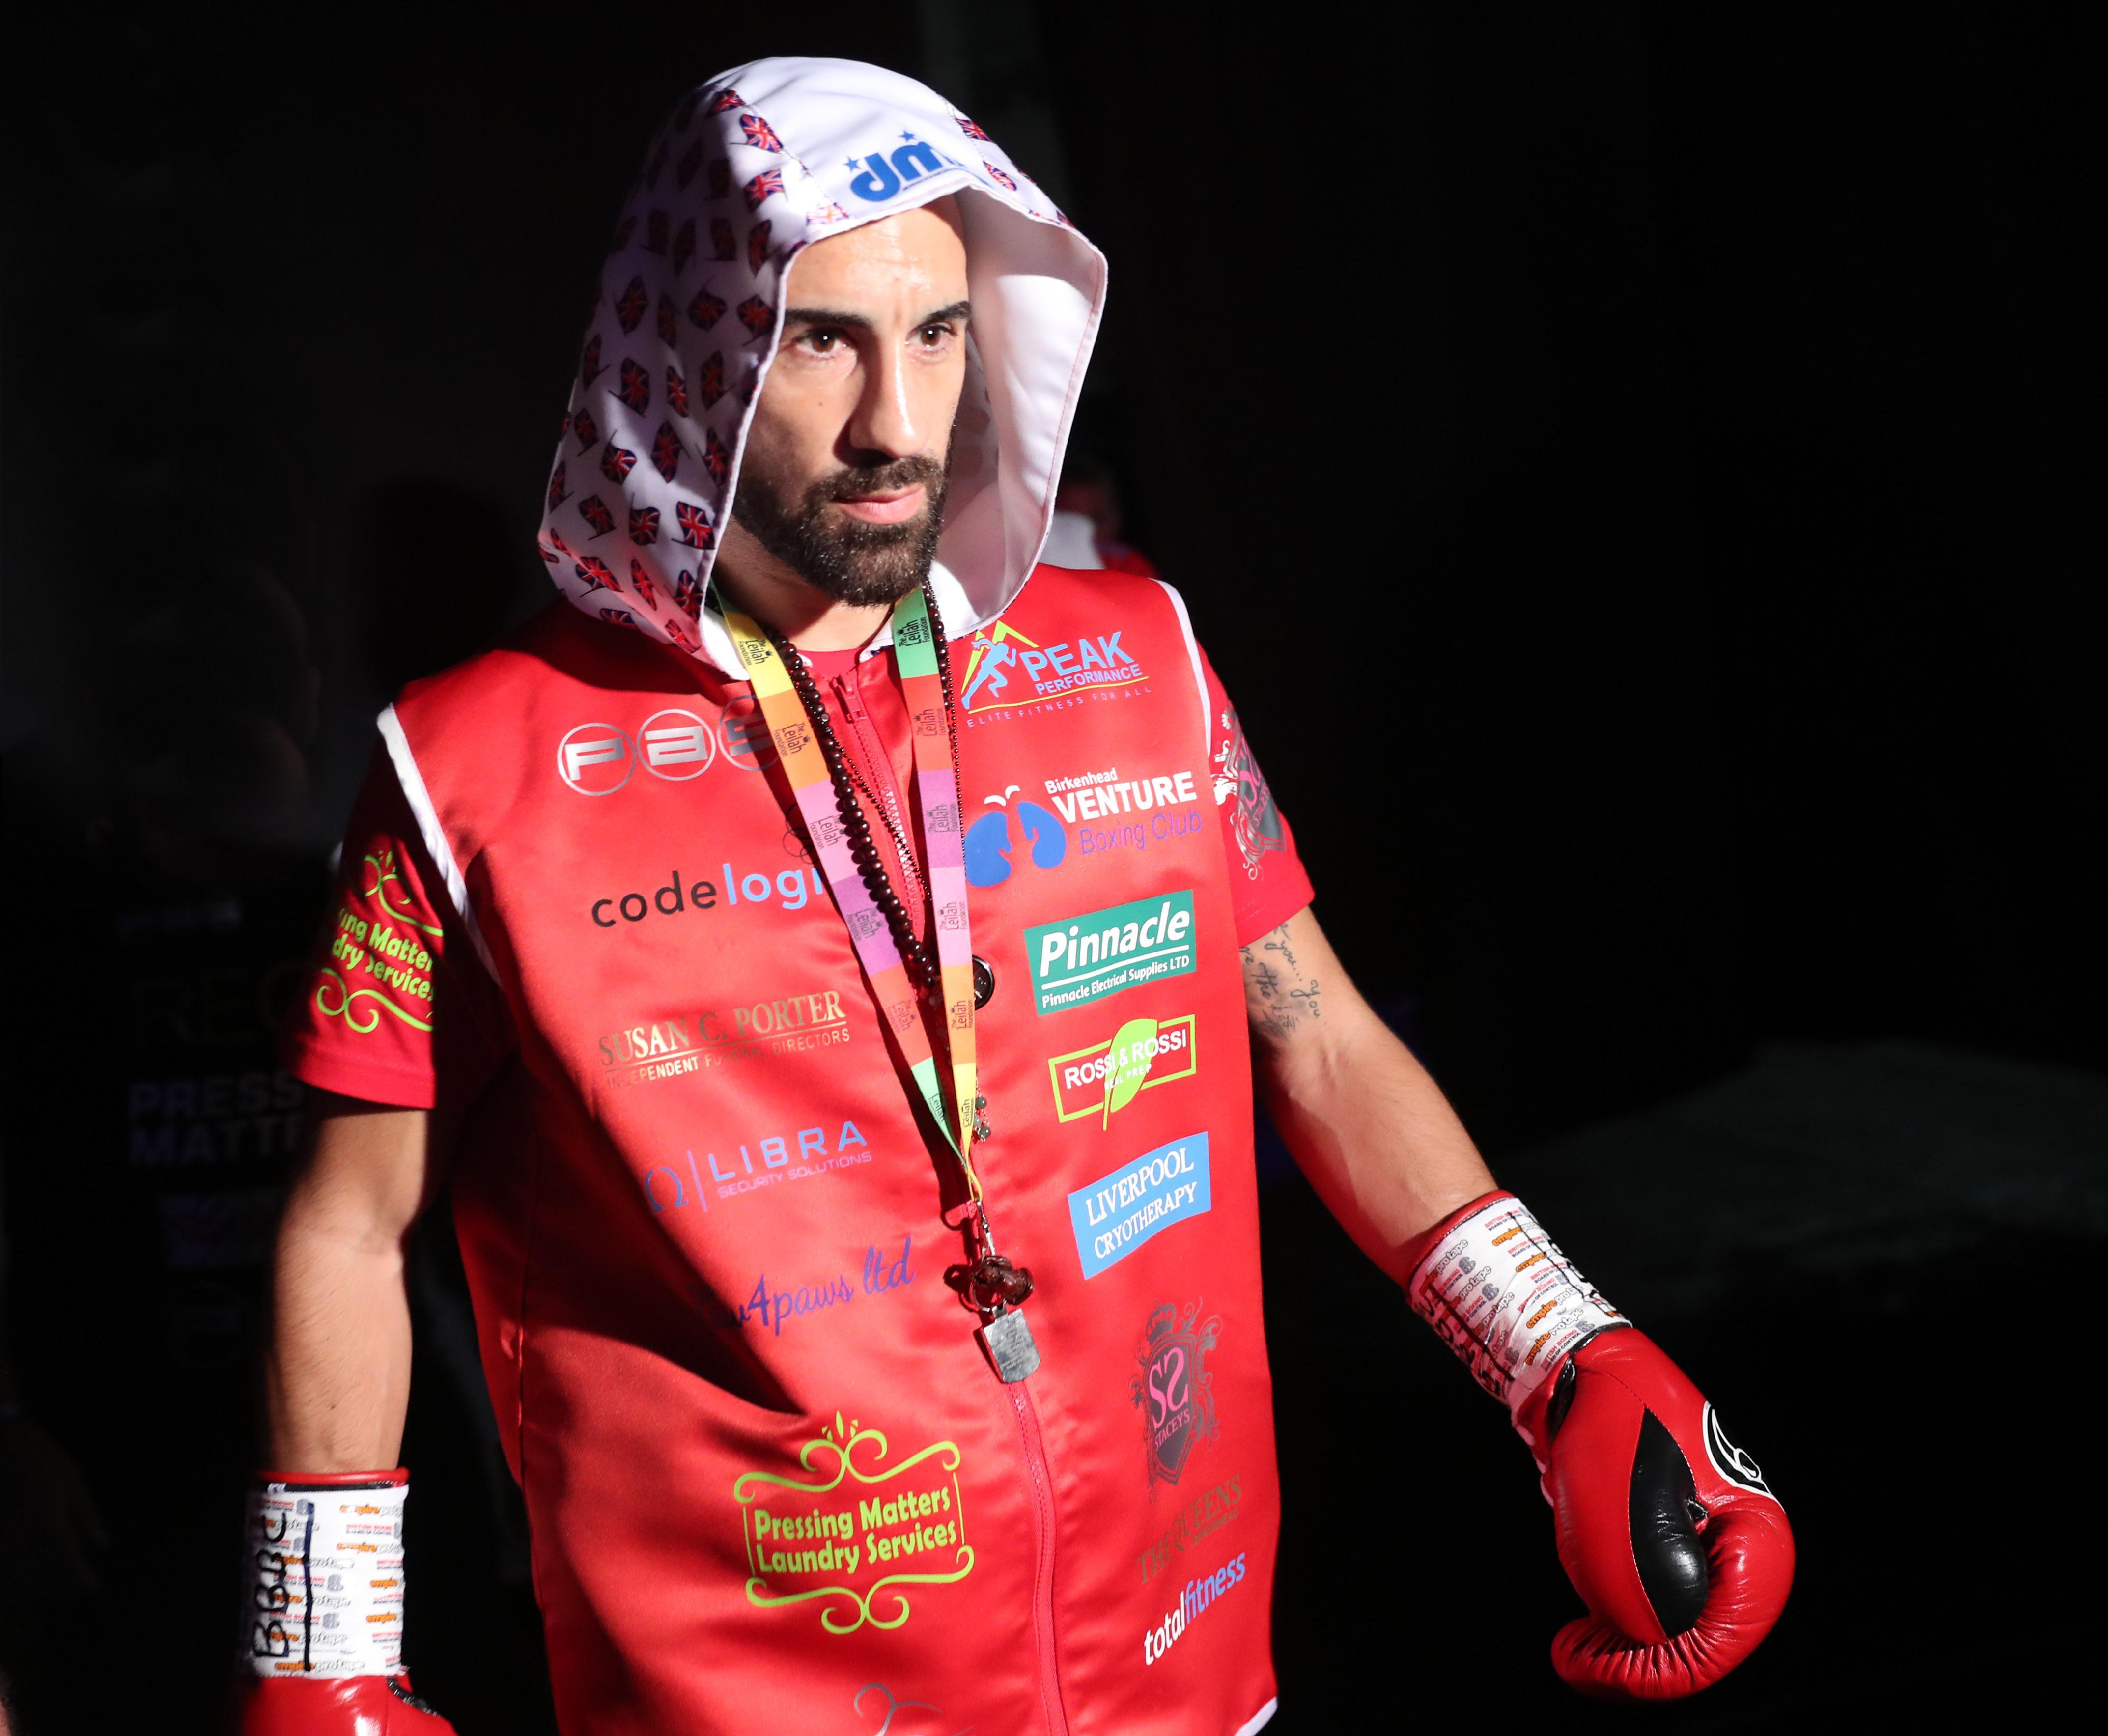 Sean 'Masher' Dodd gave Joe Cordina a tough night in the ring, despite two judges scoring it wide